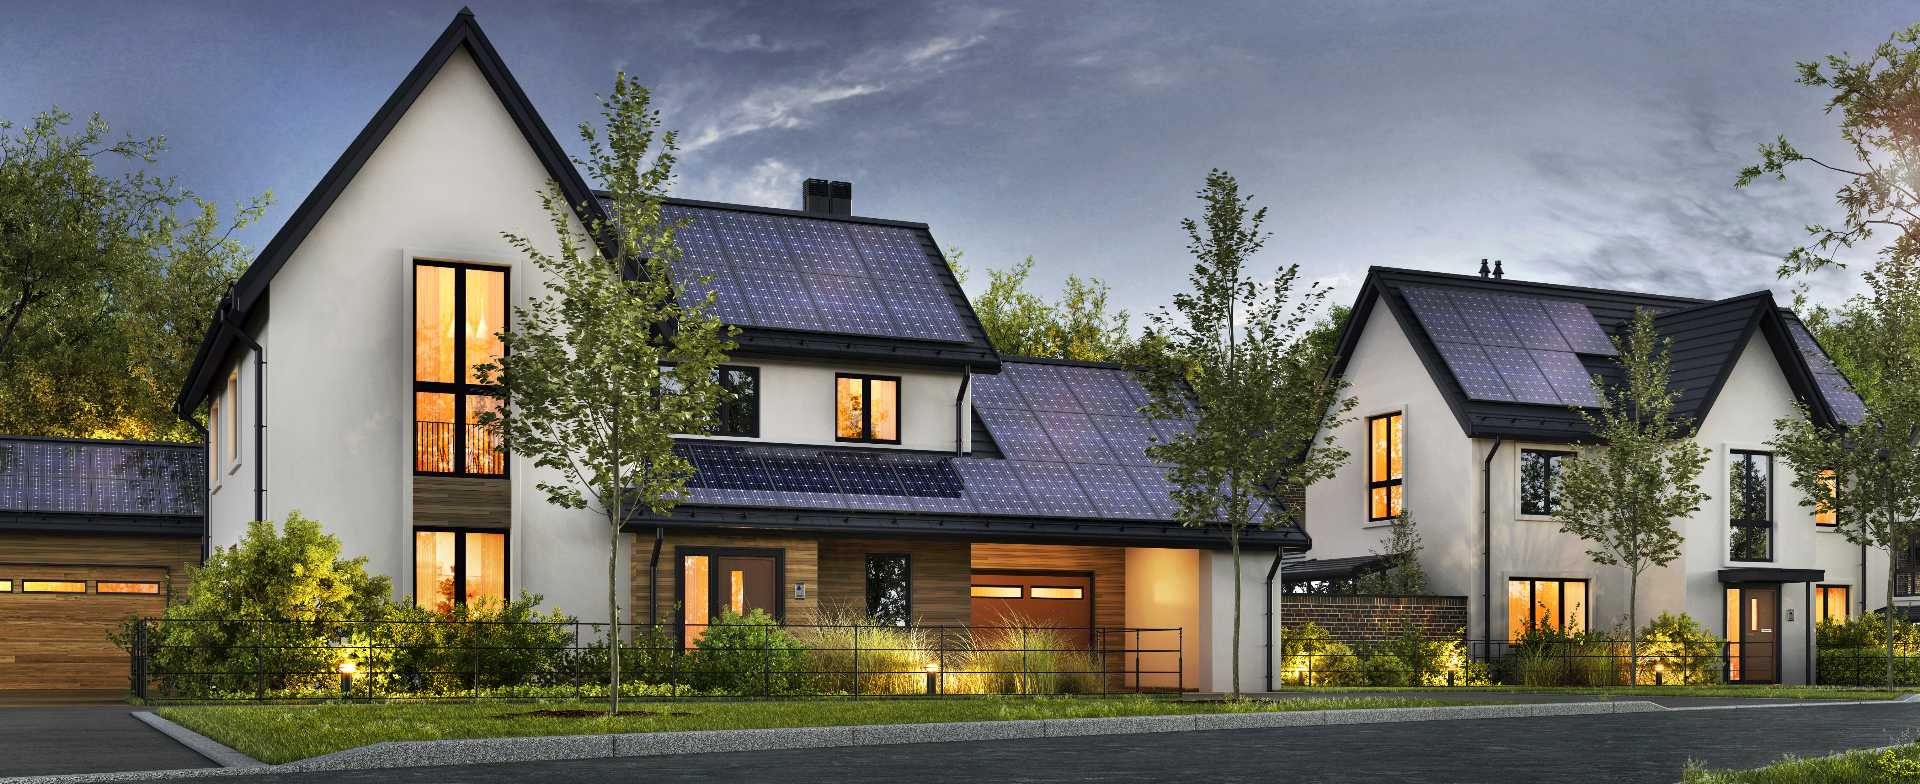 Photovoltaik Smart Home